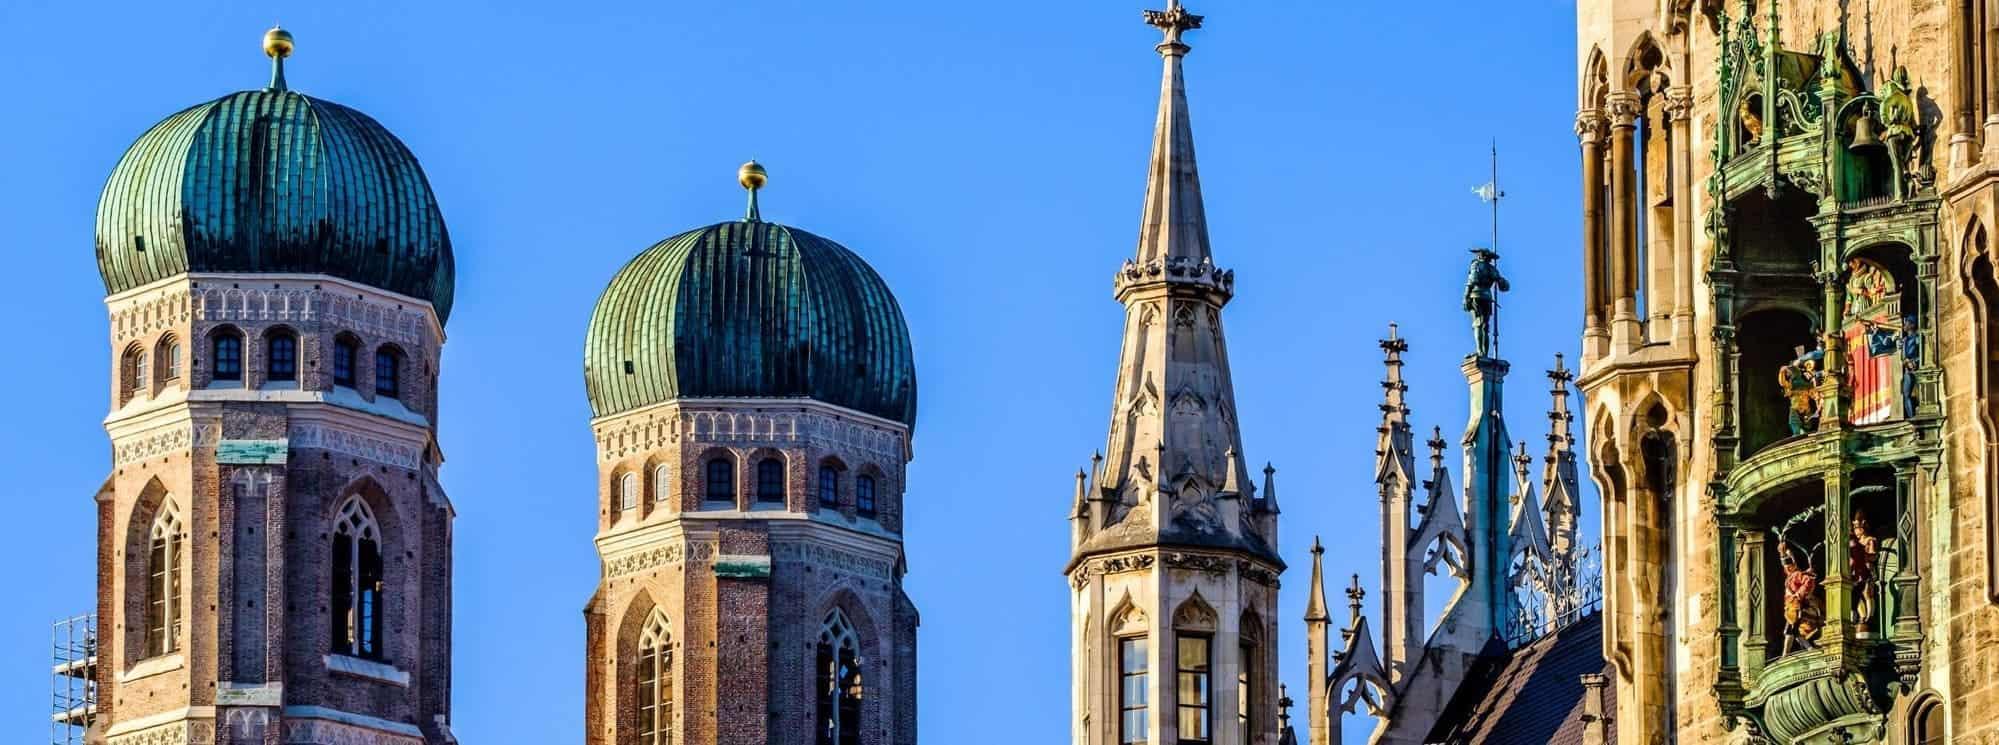 München-01-scaled